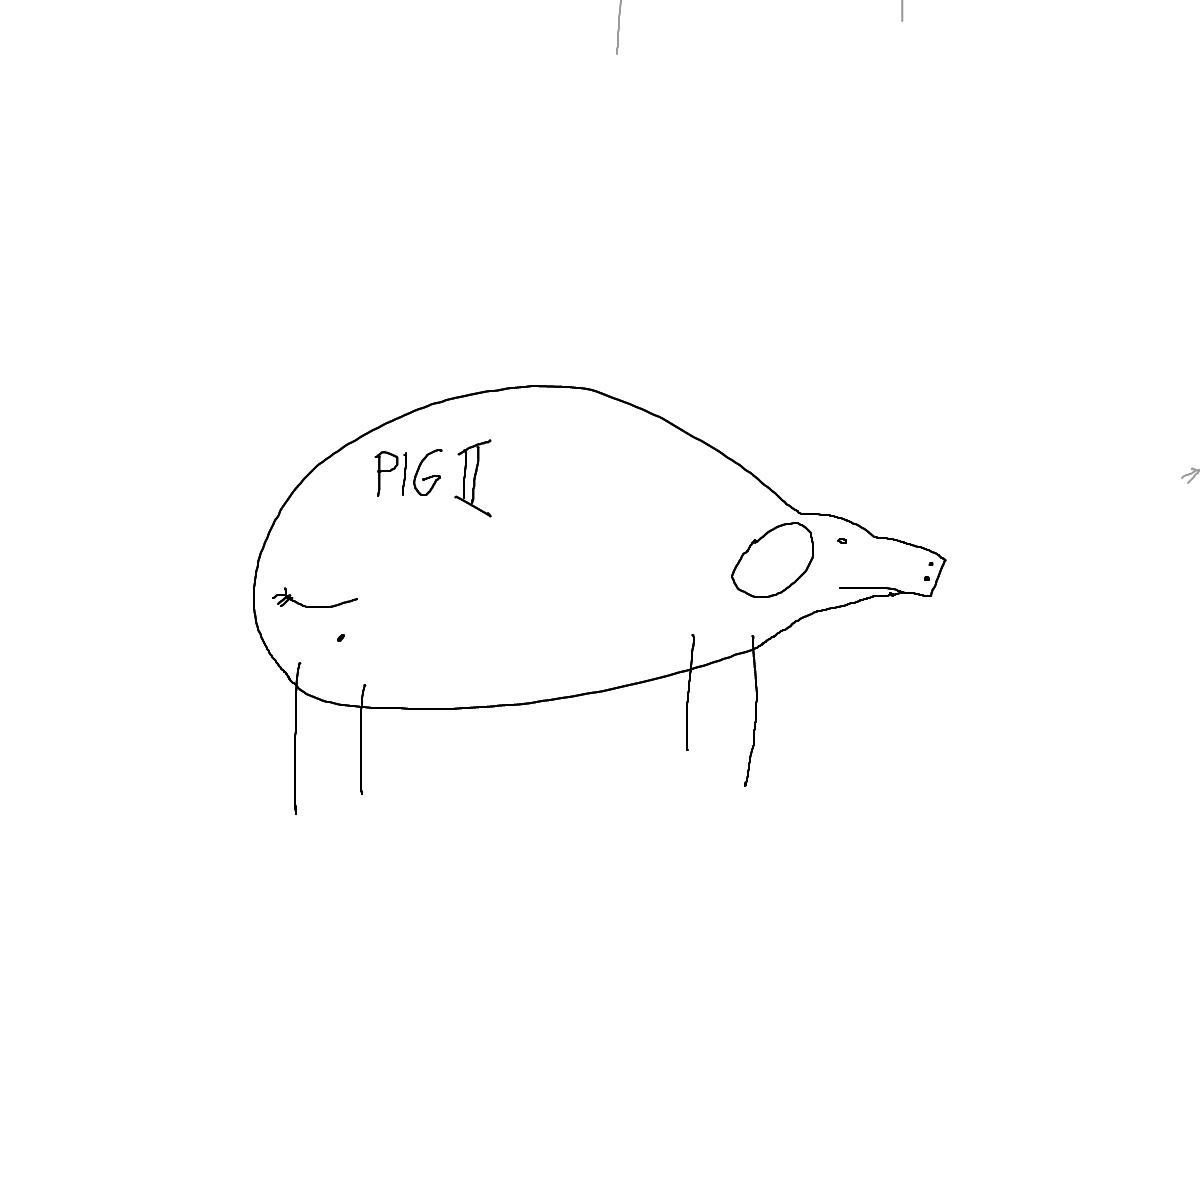 BAAAM drawing#2141 lat:52.4750175476074200lng: 13.4067735671997070